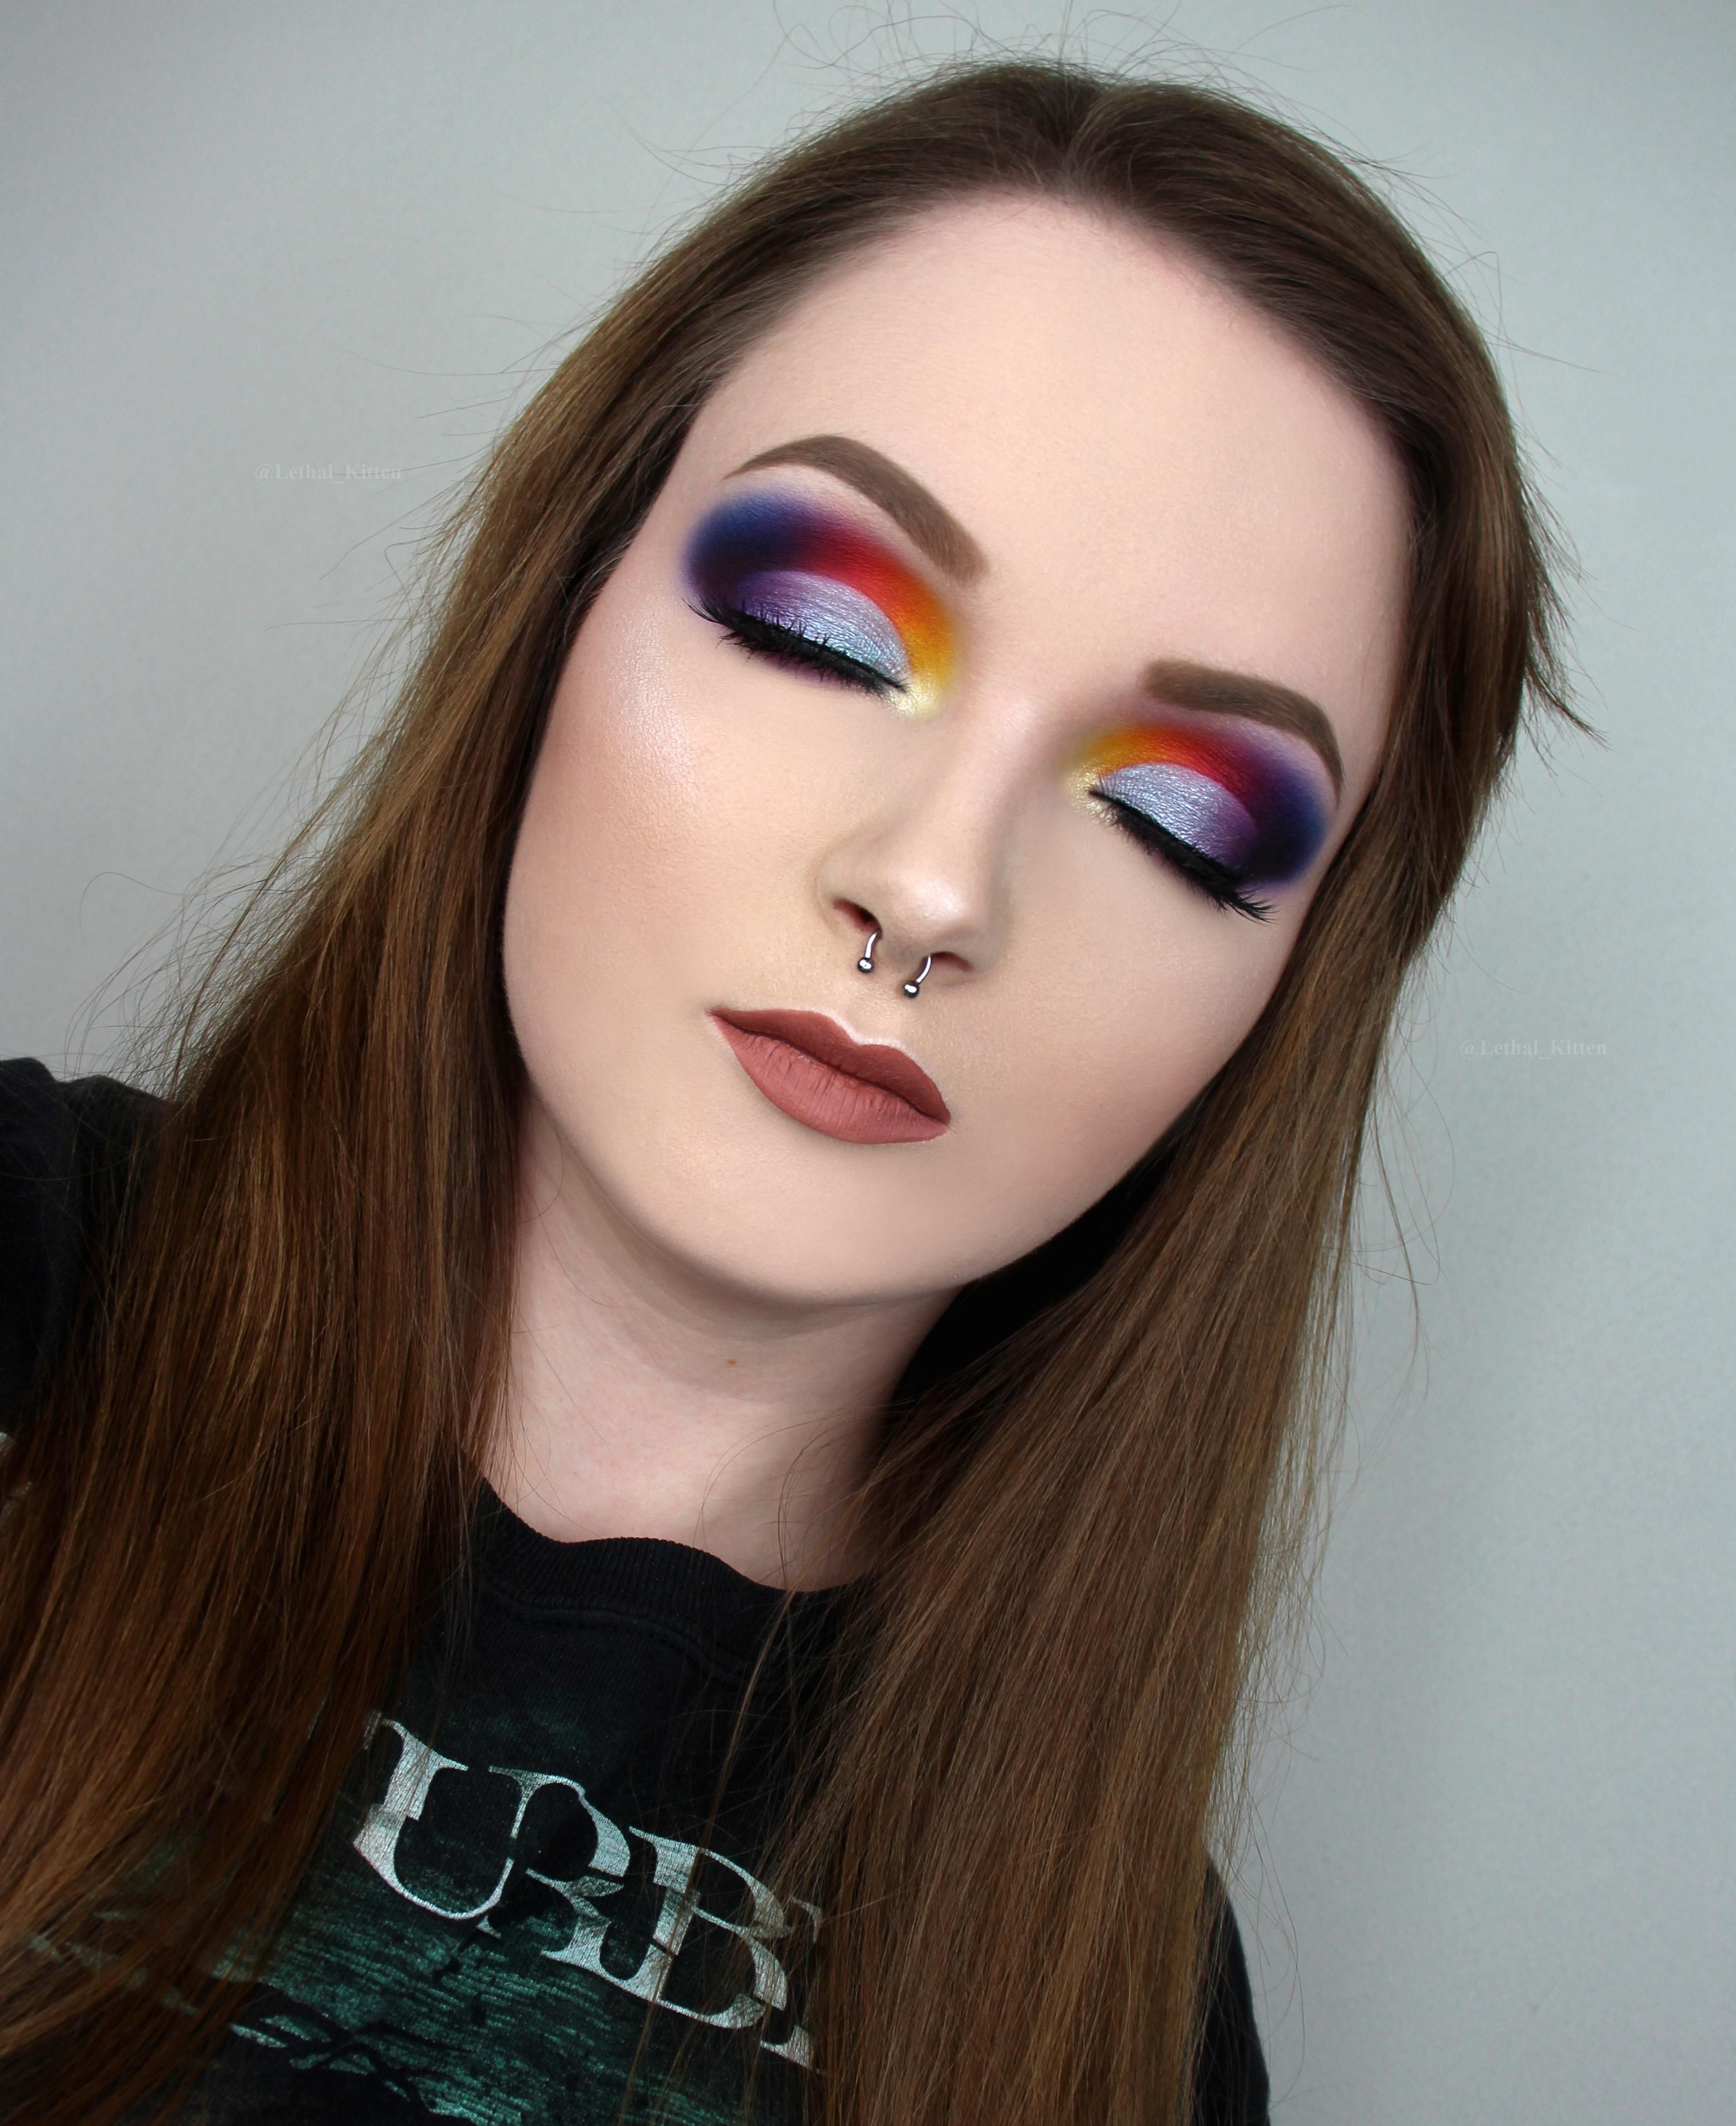 James Charles x Morphe Palette | Makeup in 2019 | Makeup, Mac makeup